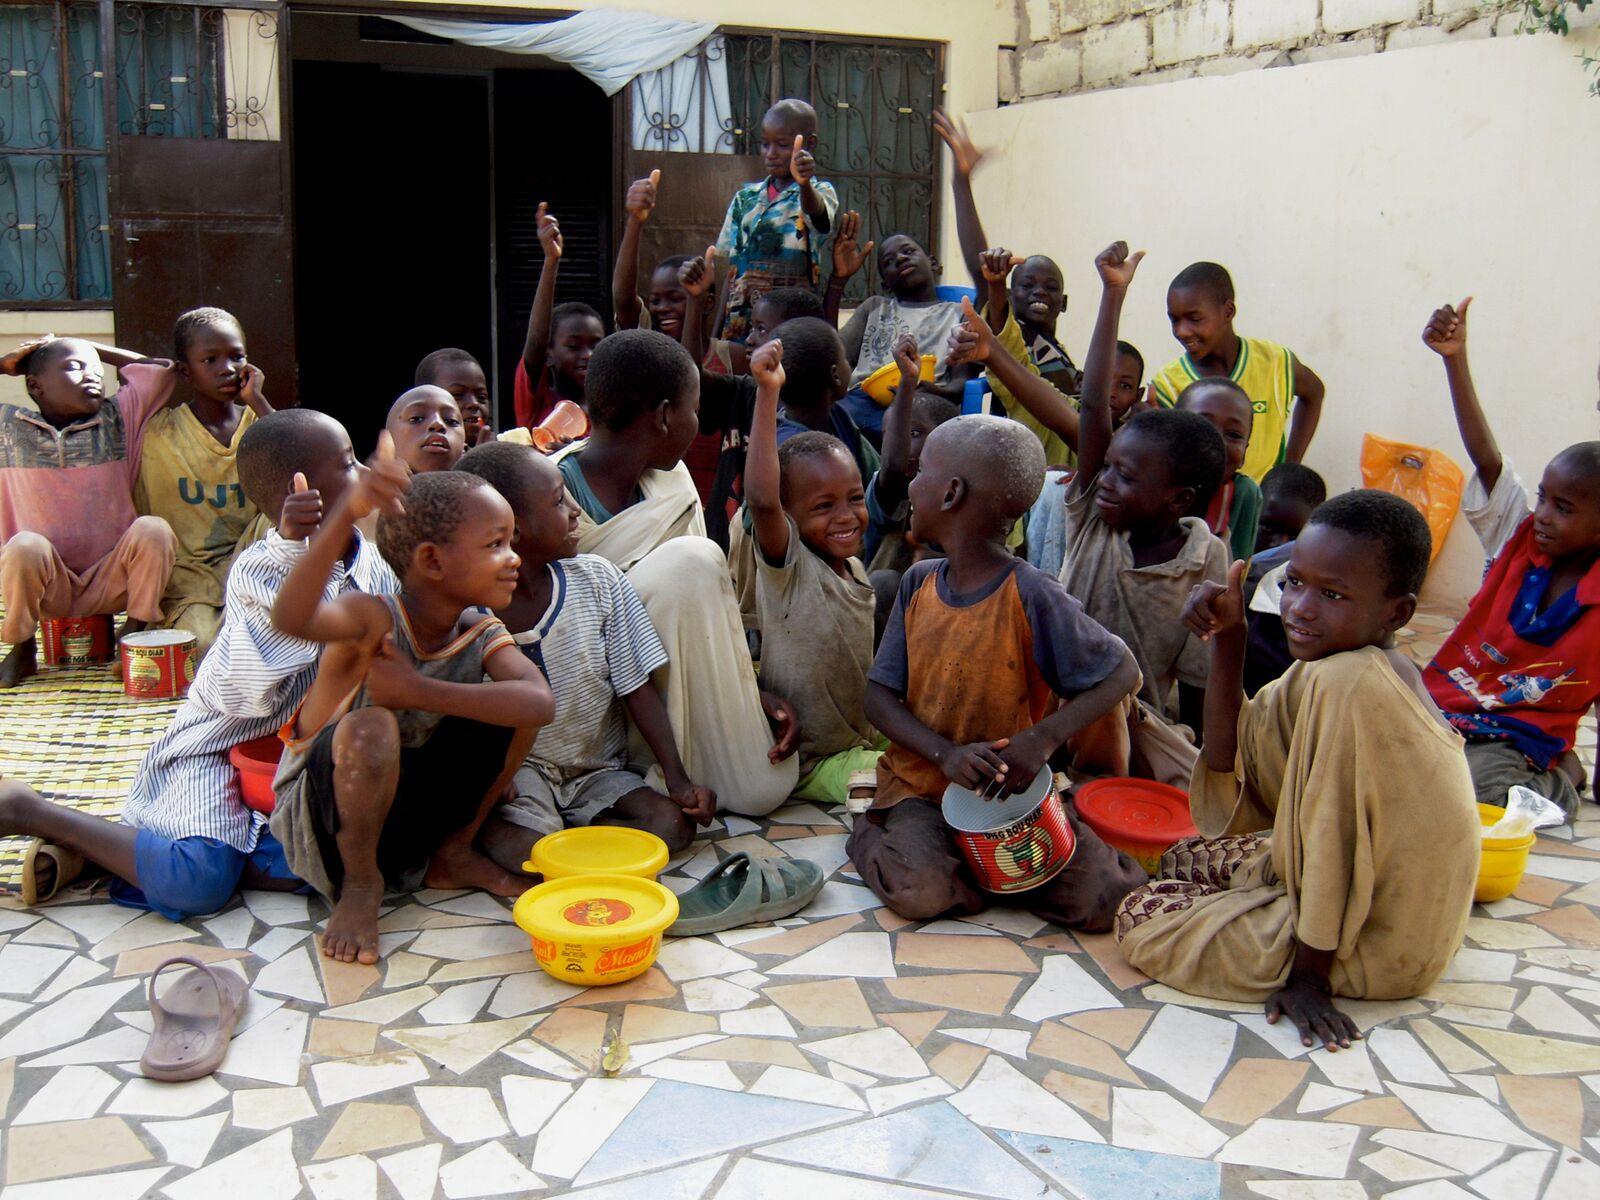 Talibe beggars in Senegal